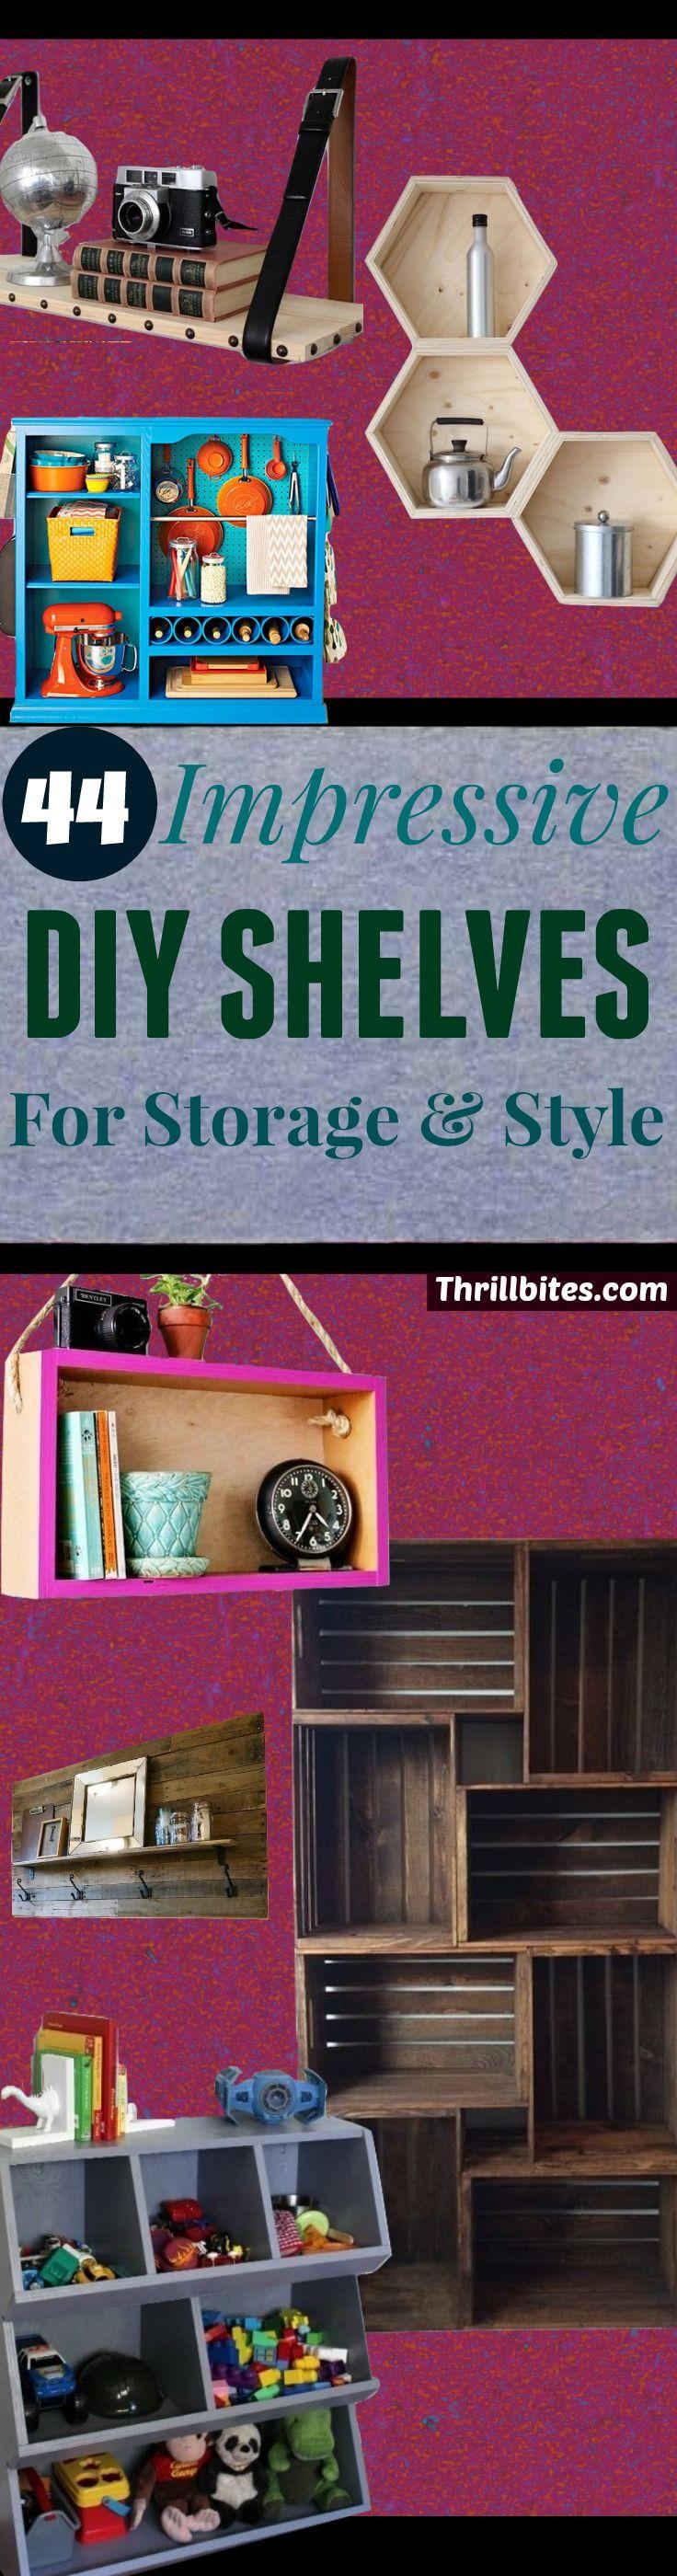 44 Impressive DIY Shelves For Storage & Style | DIY Projects & Crafts | Ideas | Easy DIY Floating Shelves for bathroom,bedroom,kitchen,closet | DIY bookshelves and Home Decor Ideas